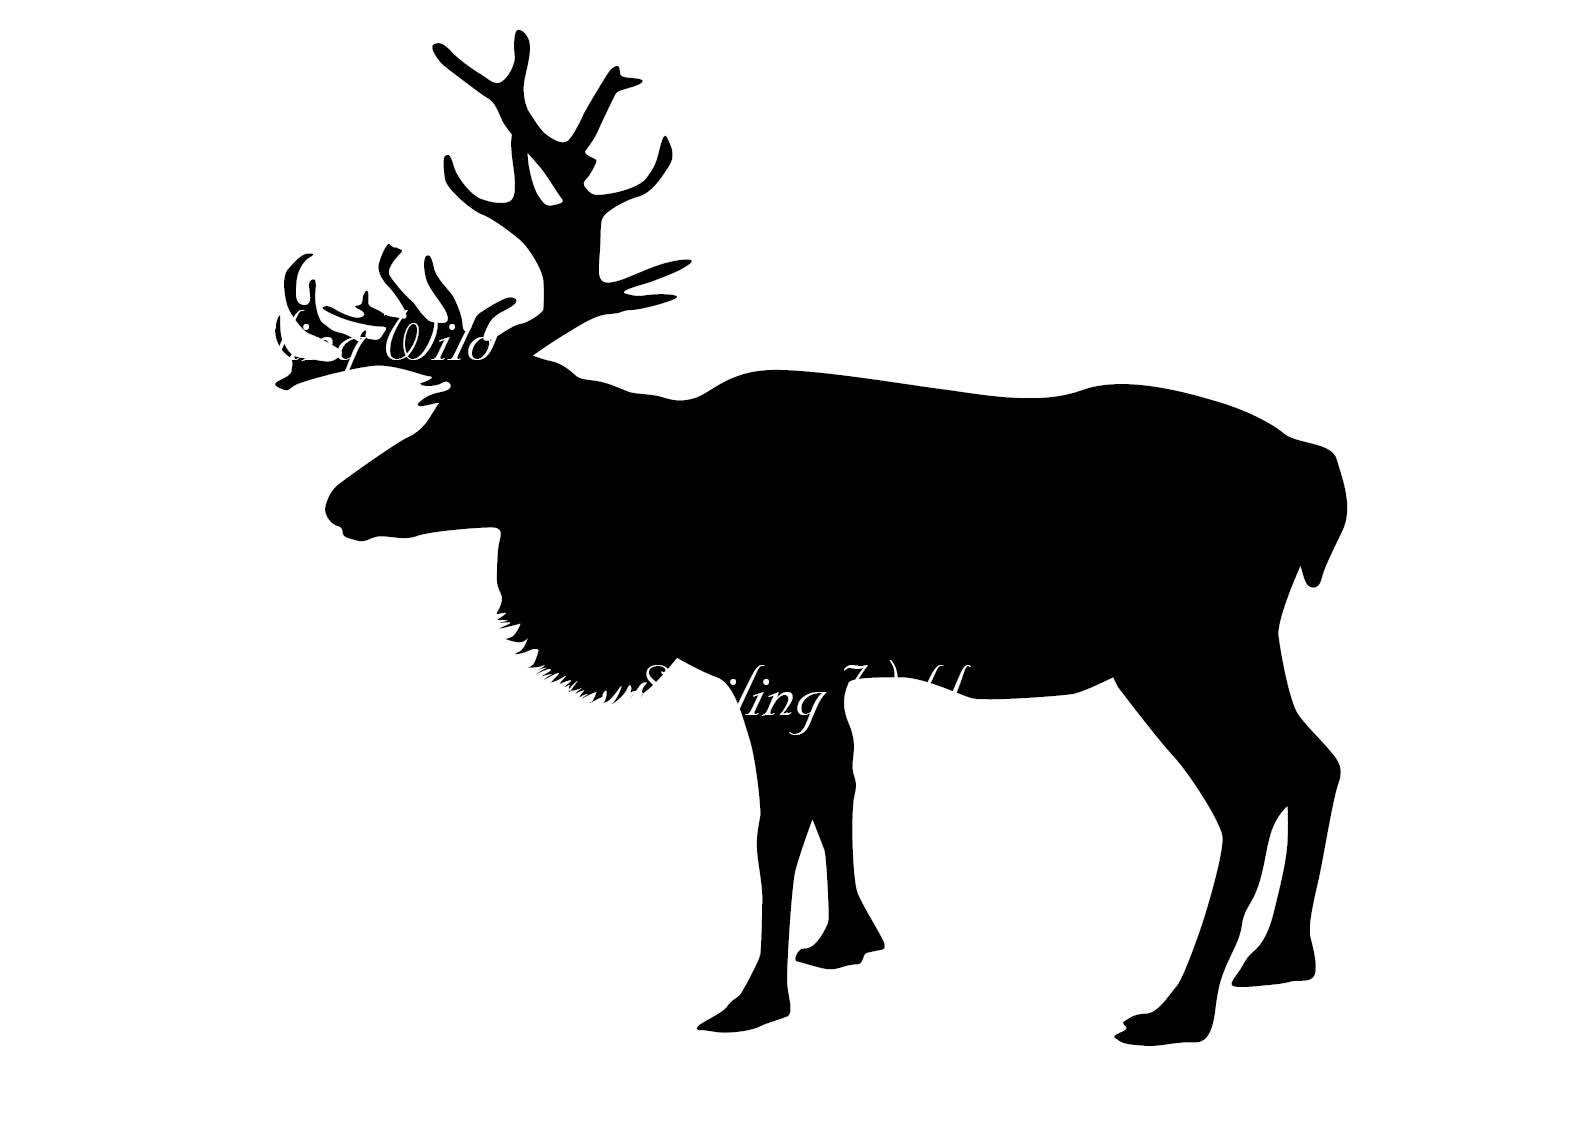 1588x1123 Caribou Silhouette Reindeer Svg Santa Claus Christmas Deer Cut Out